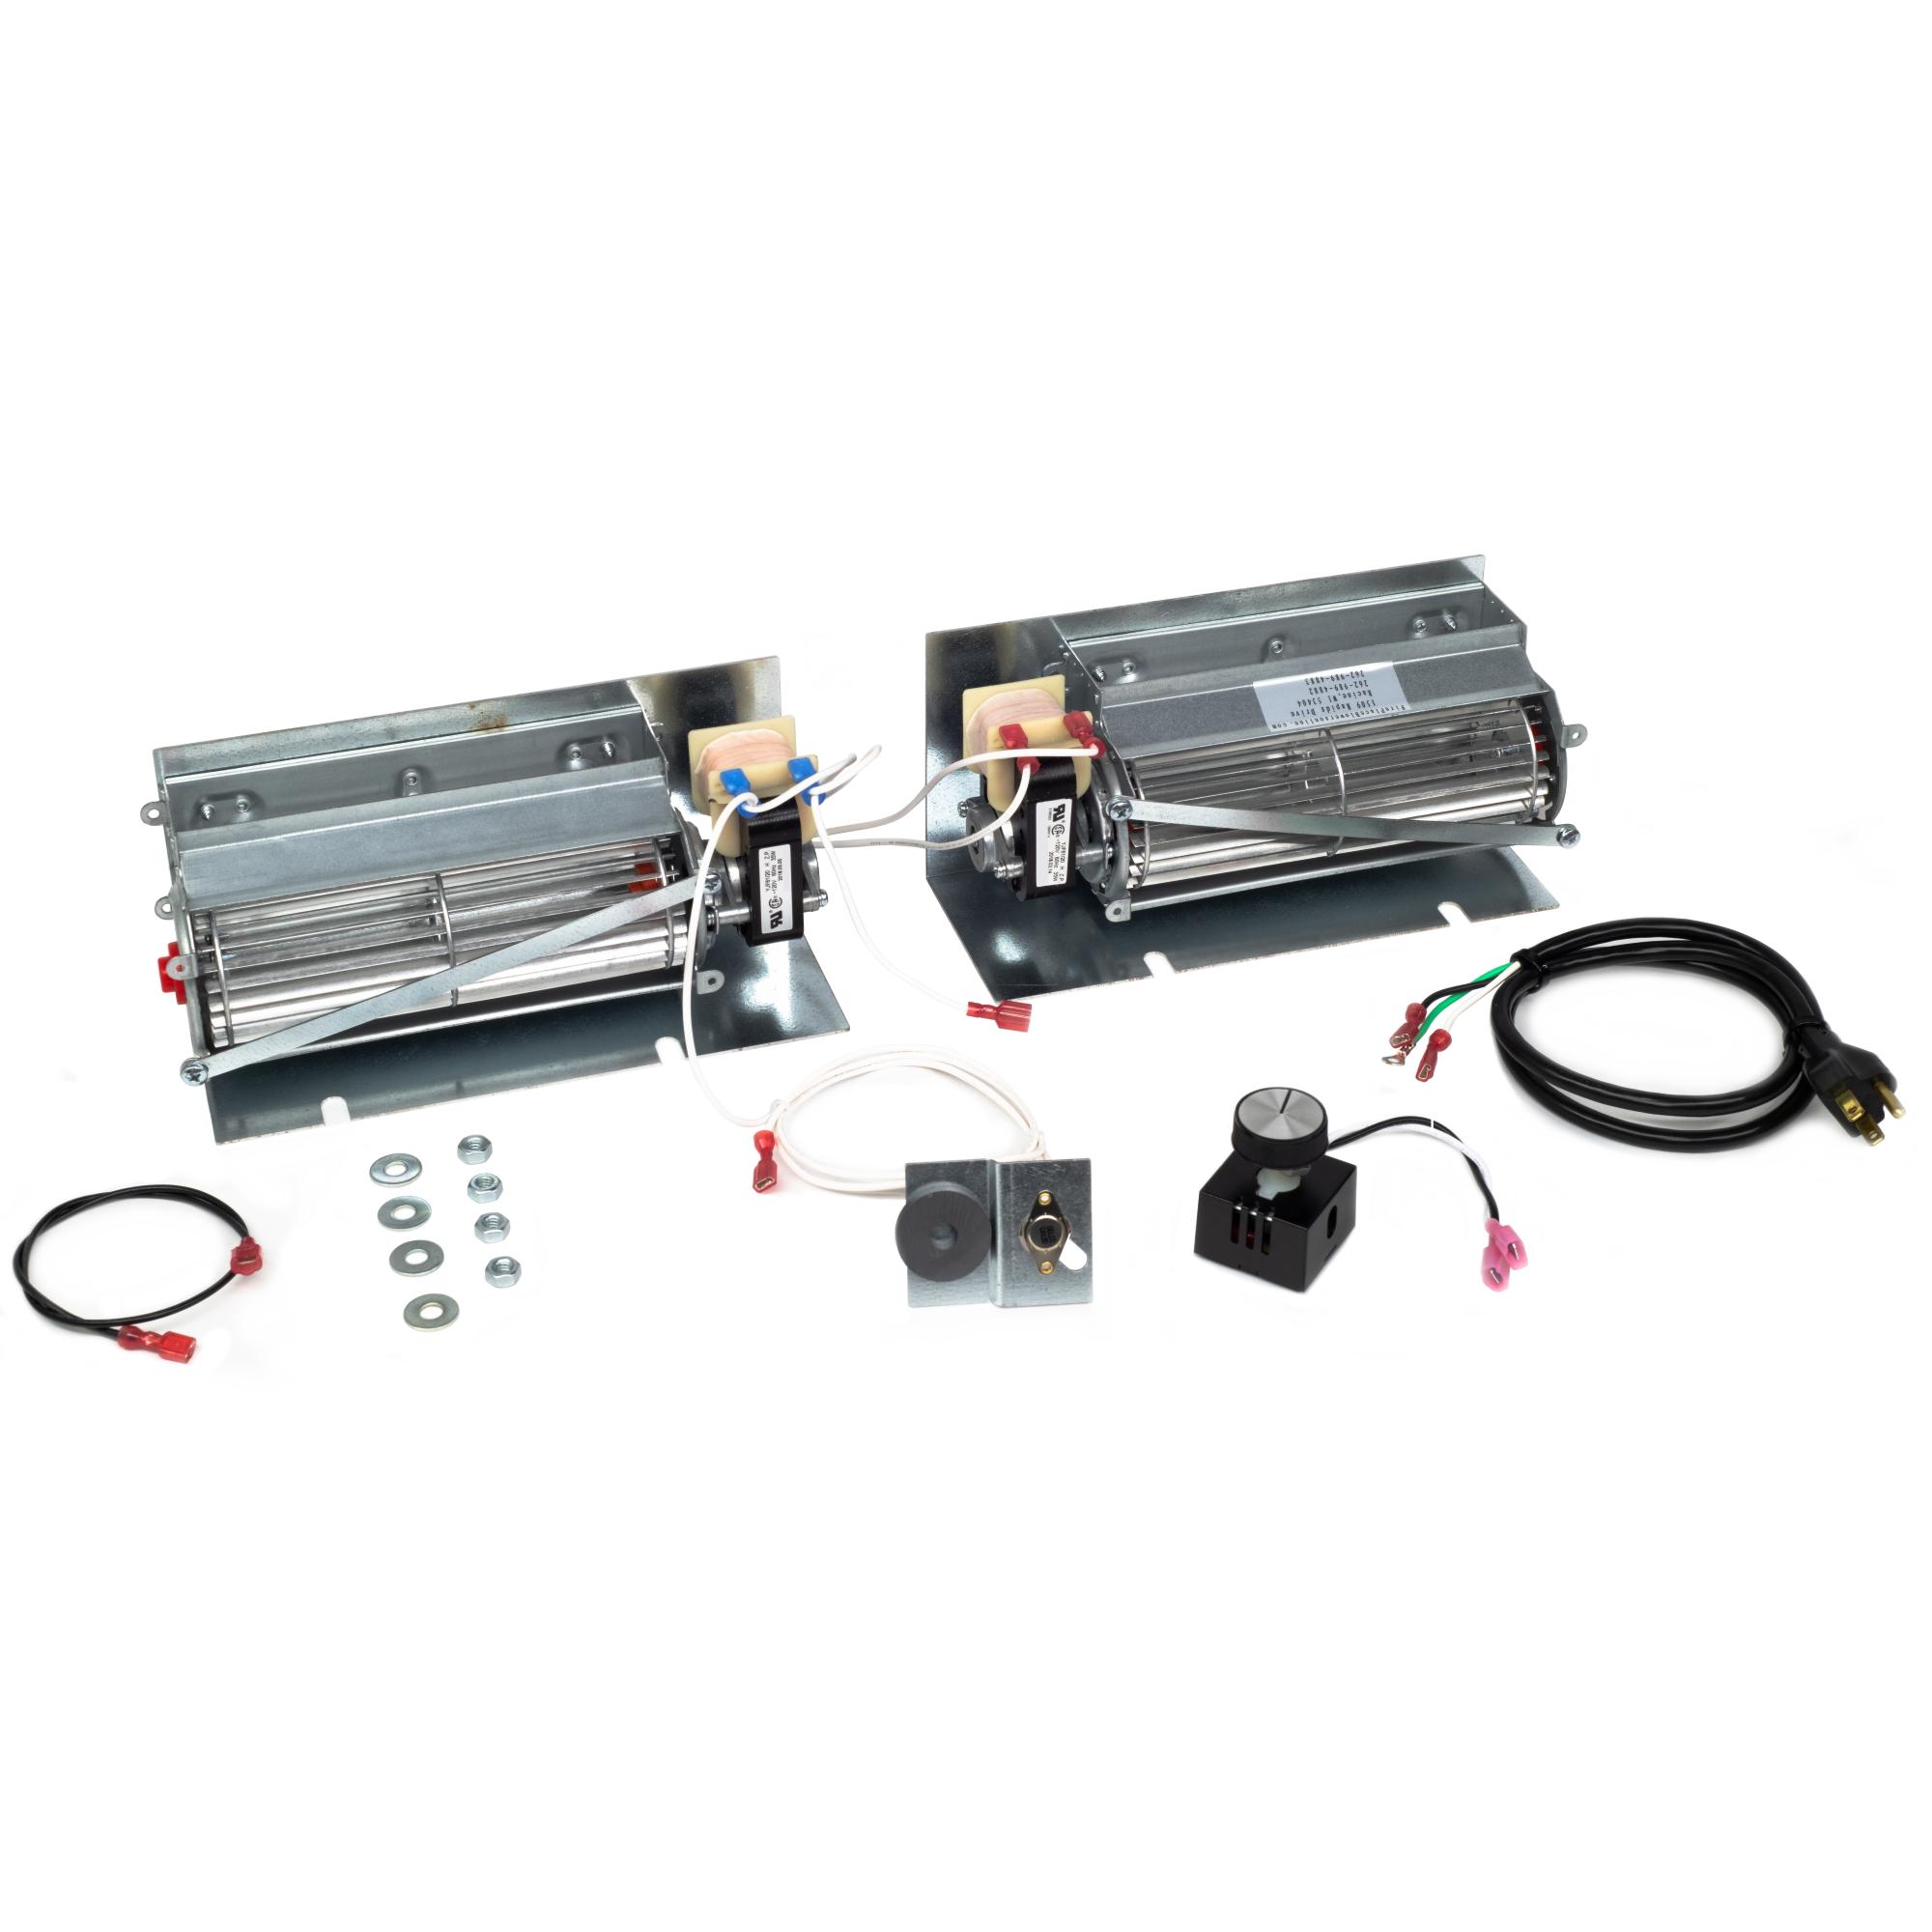 600-1 Fireplace Blower Kit for Kozy Heat Fireplaces